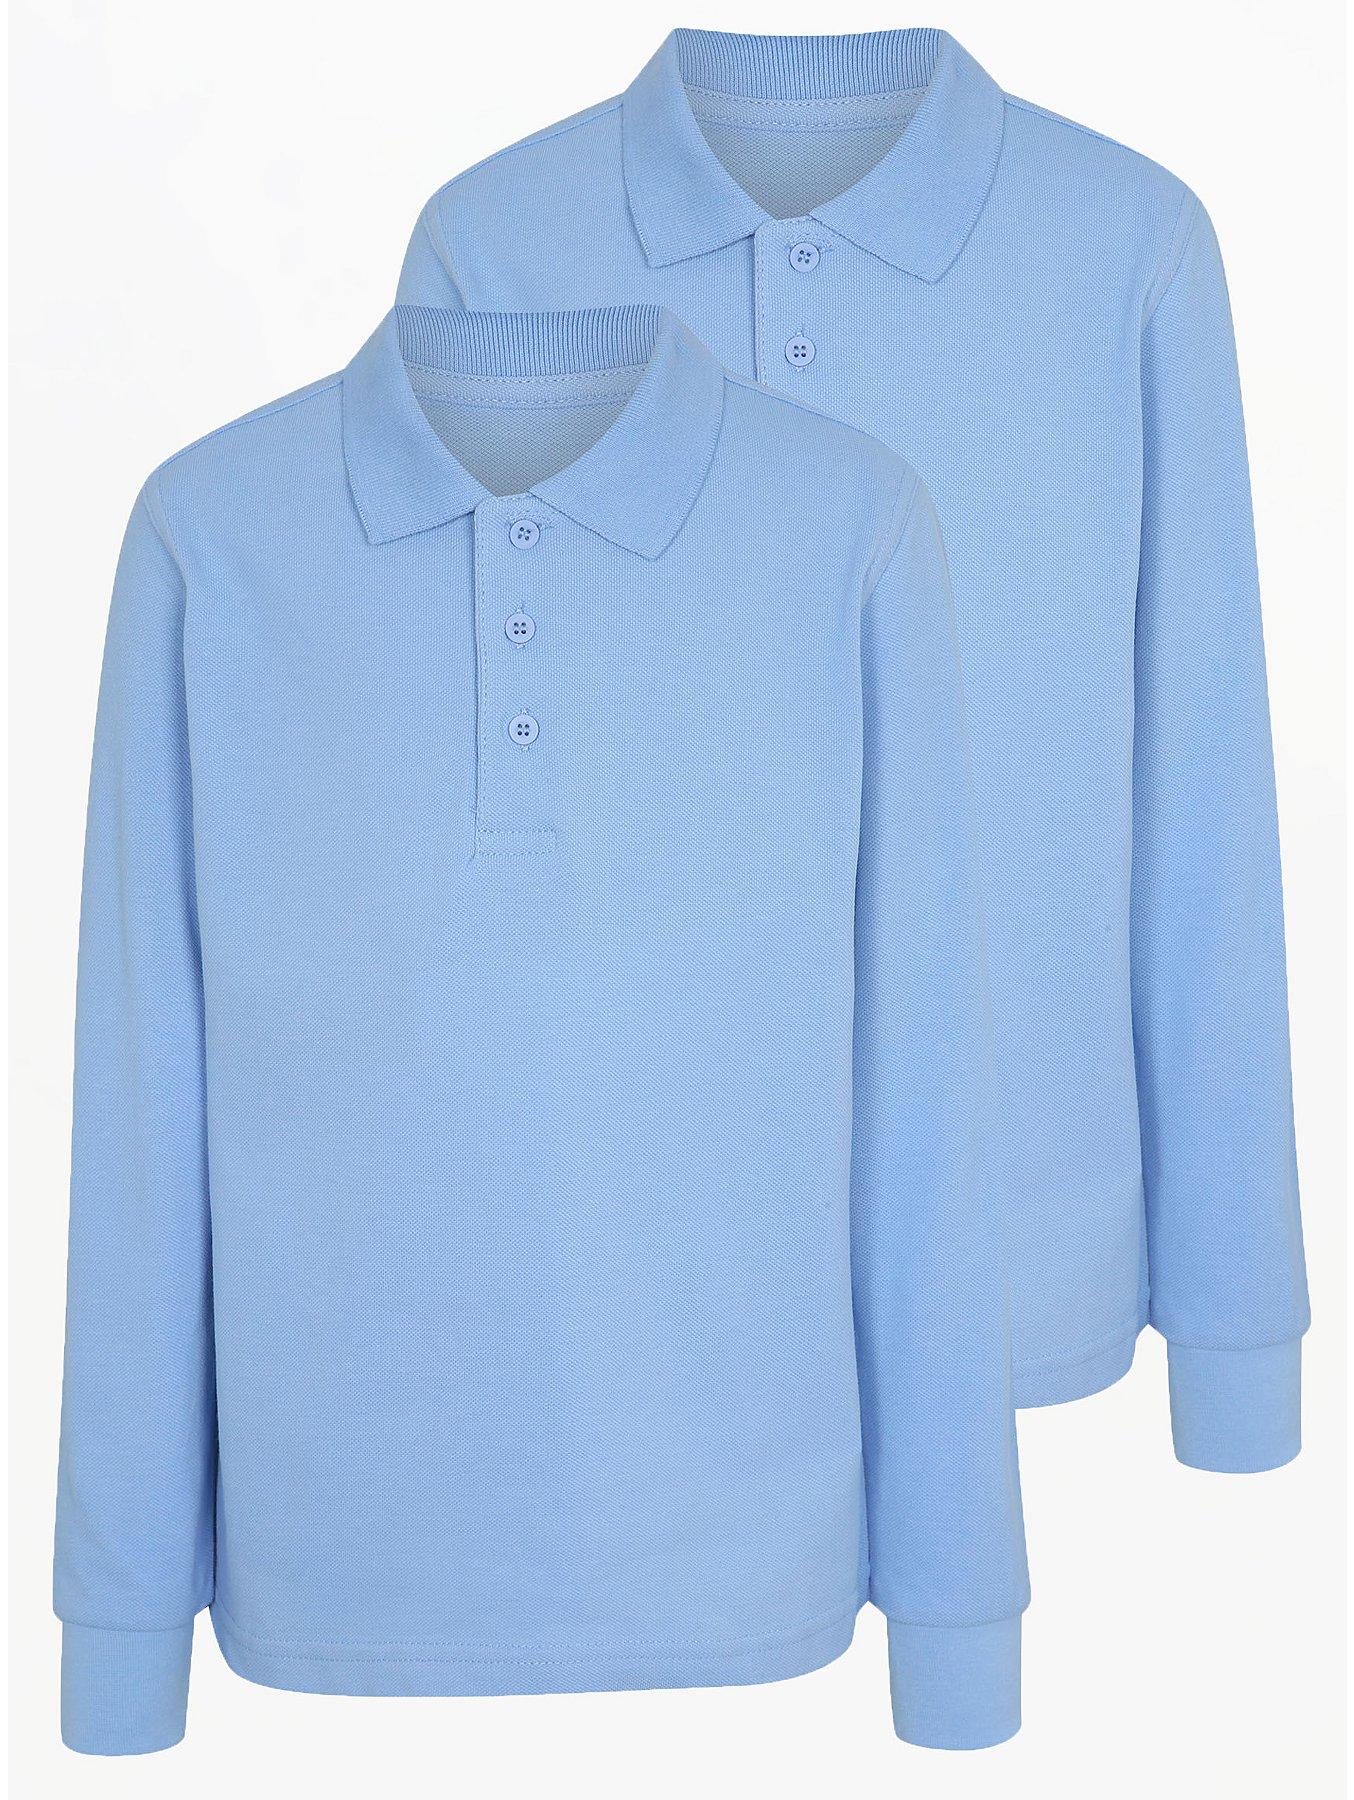 Boys Light Blue Long Sleeve School Polo Shirt 2 Pack School George